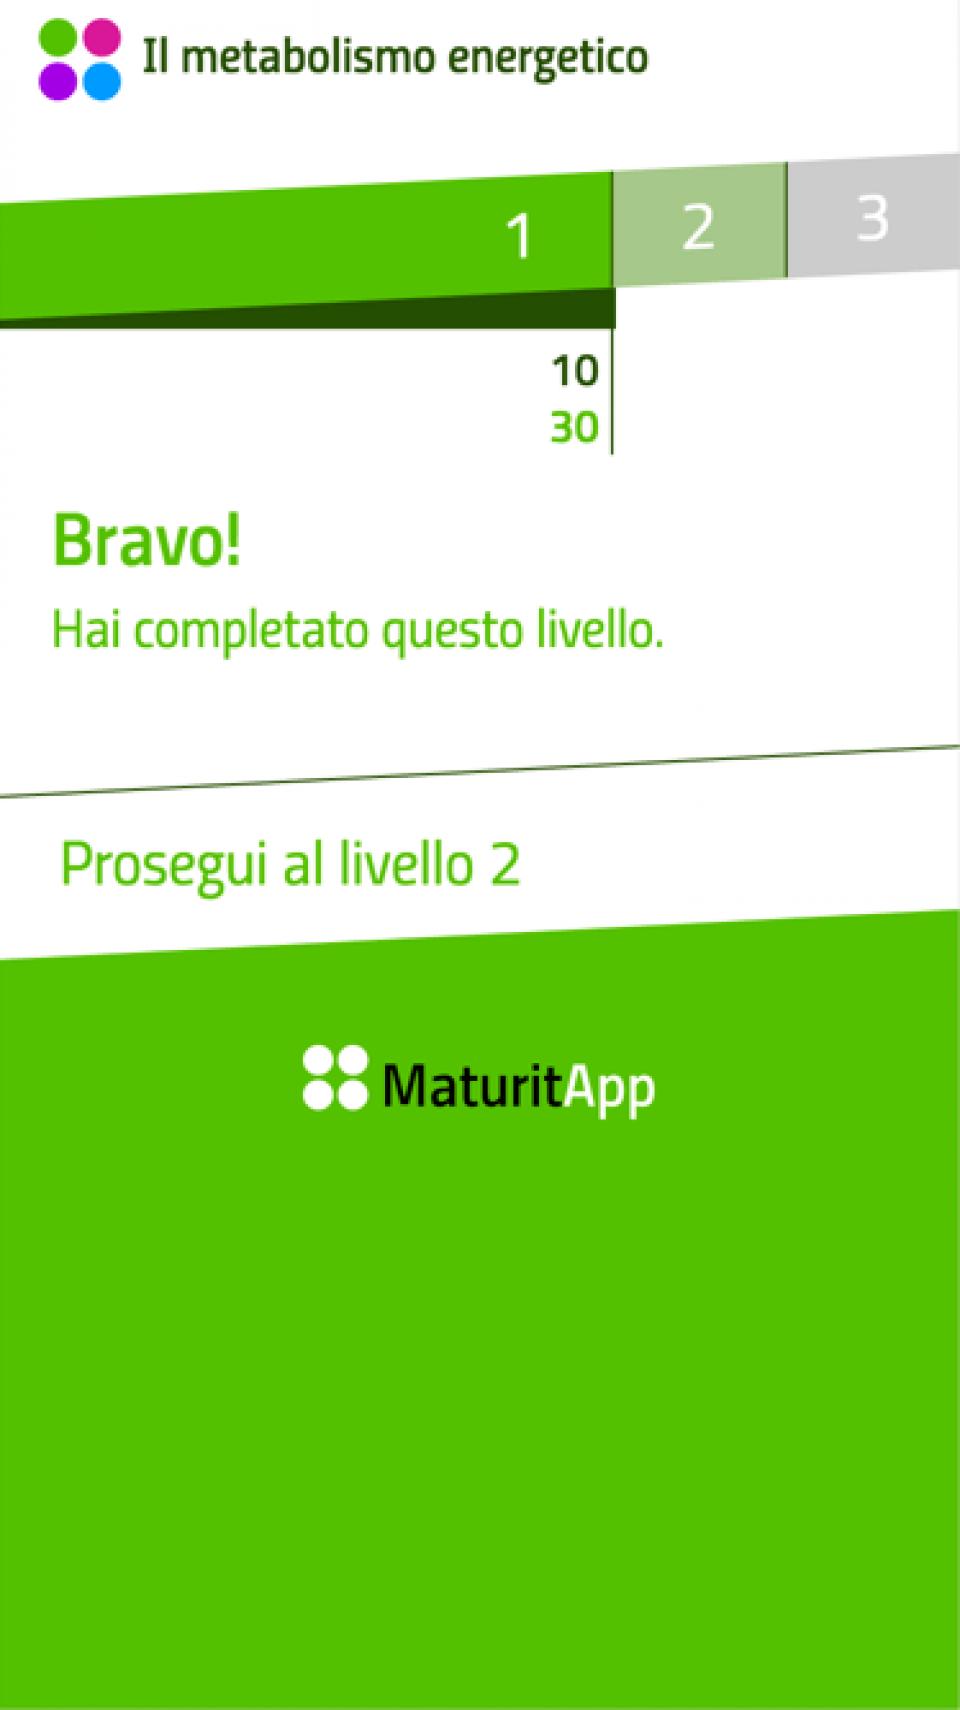 chialab-zanichelli-maturitapp-app-05.png